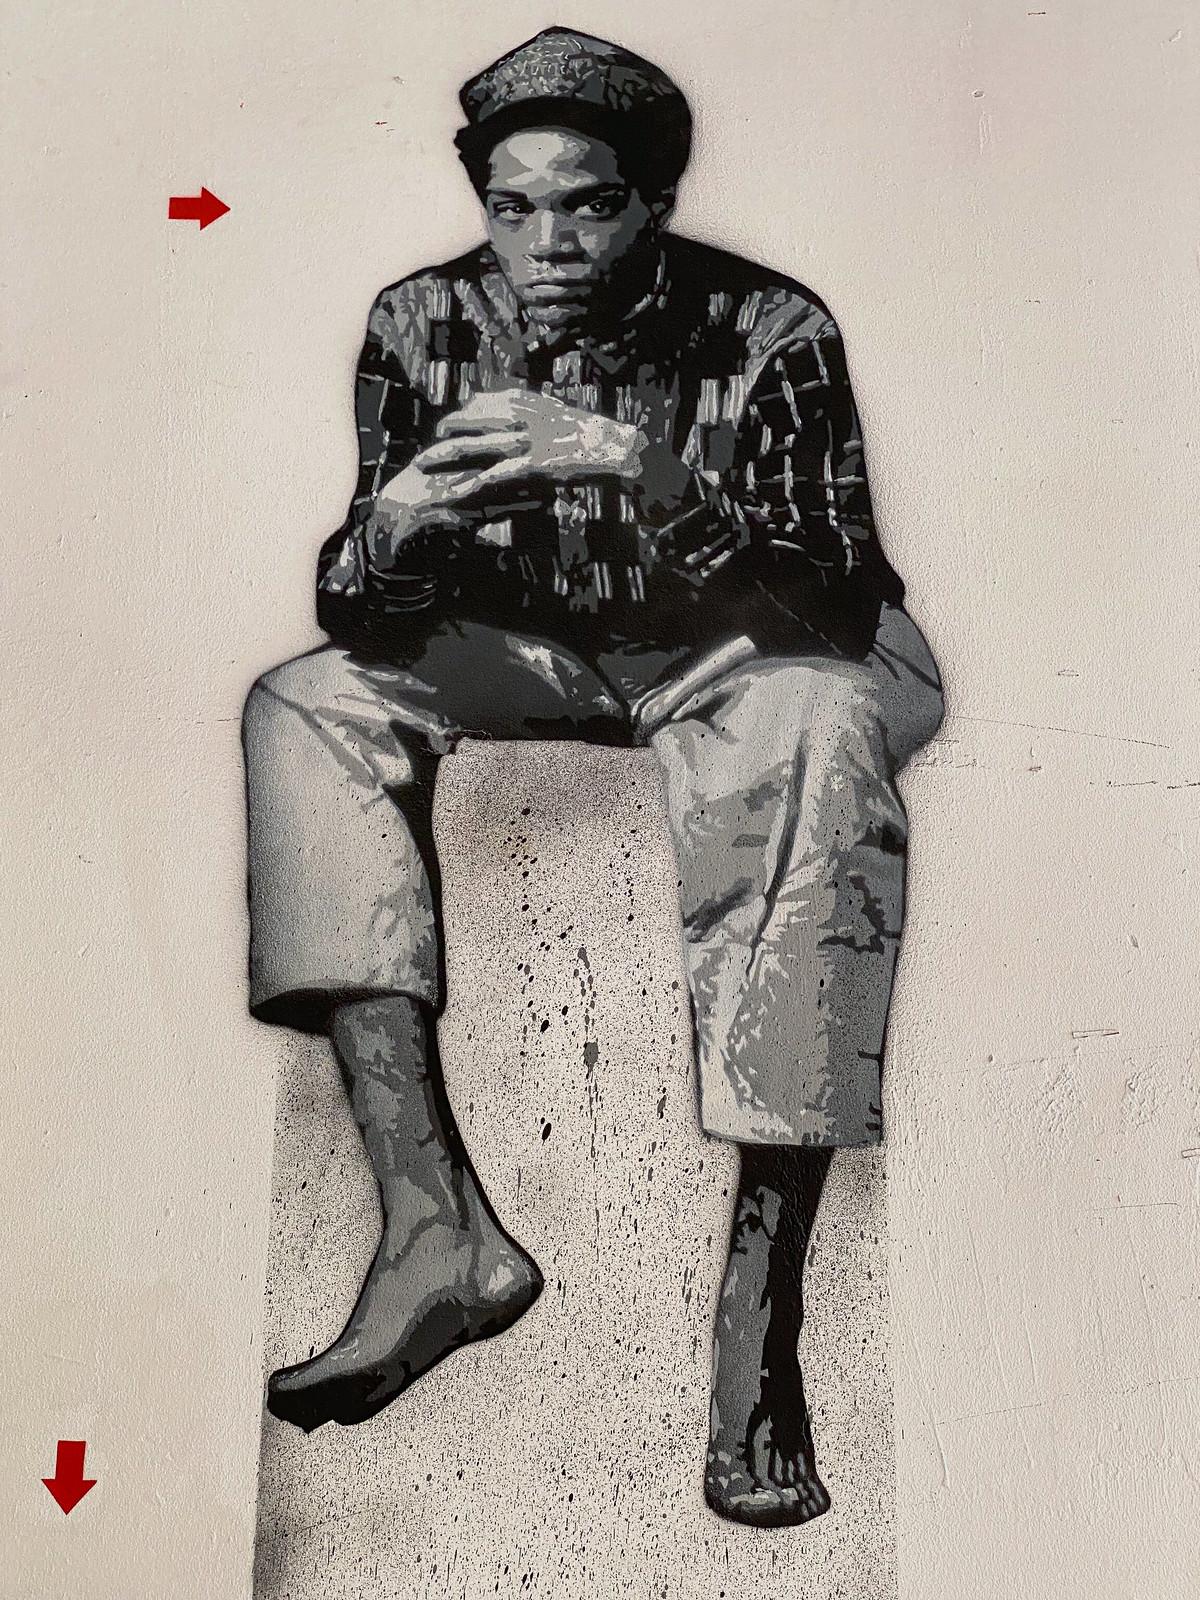 Basquiat by Jef Aérosol